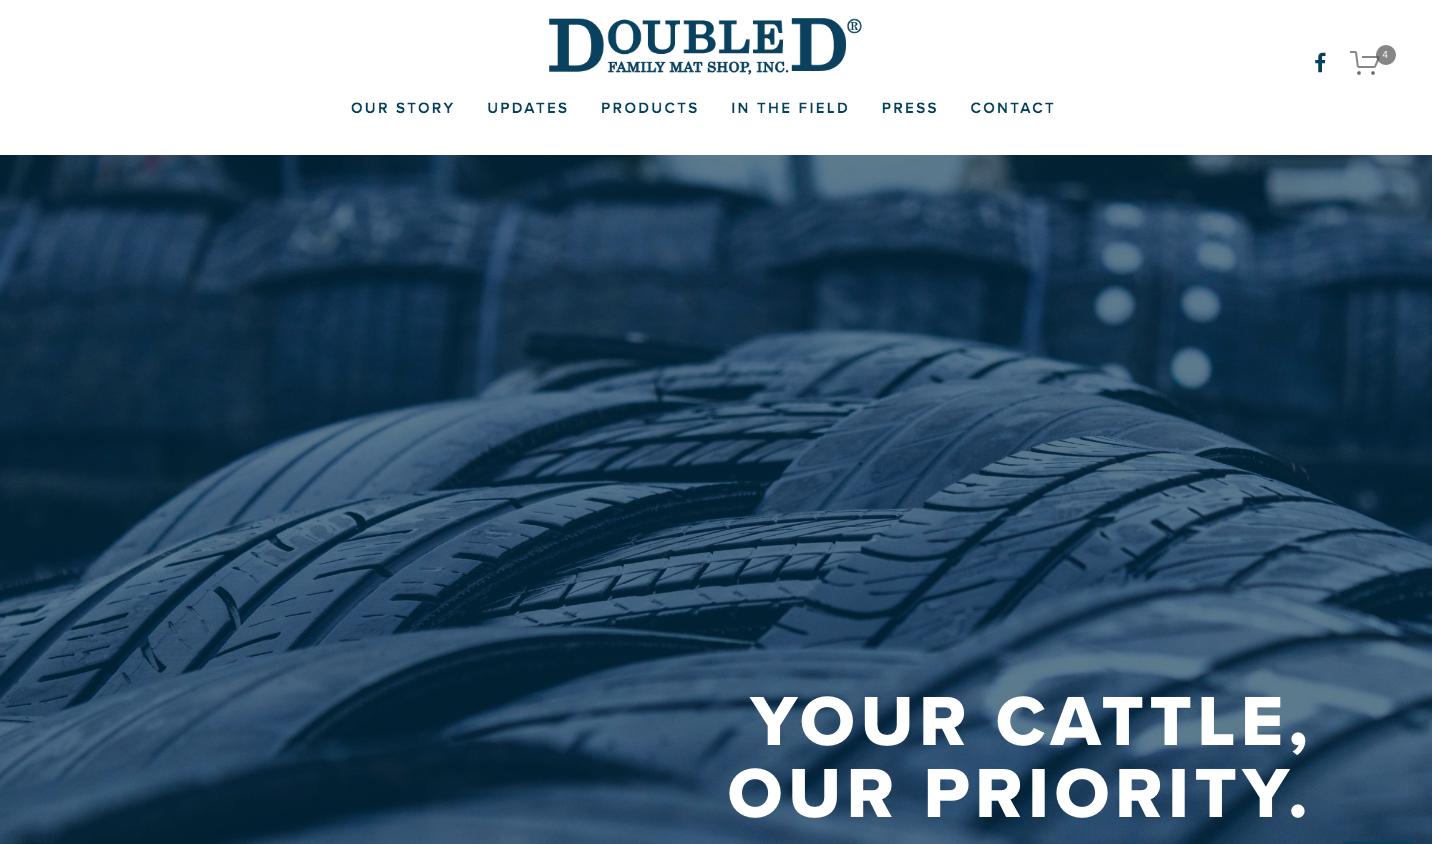 Screenshot of updated Double D Family Mat hop website designed by Custer Creative.